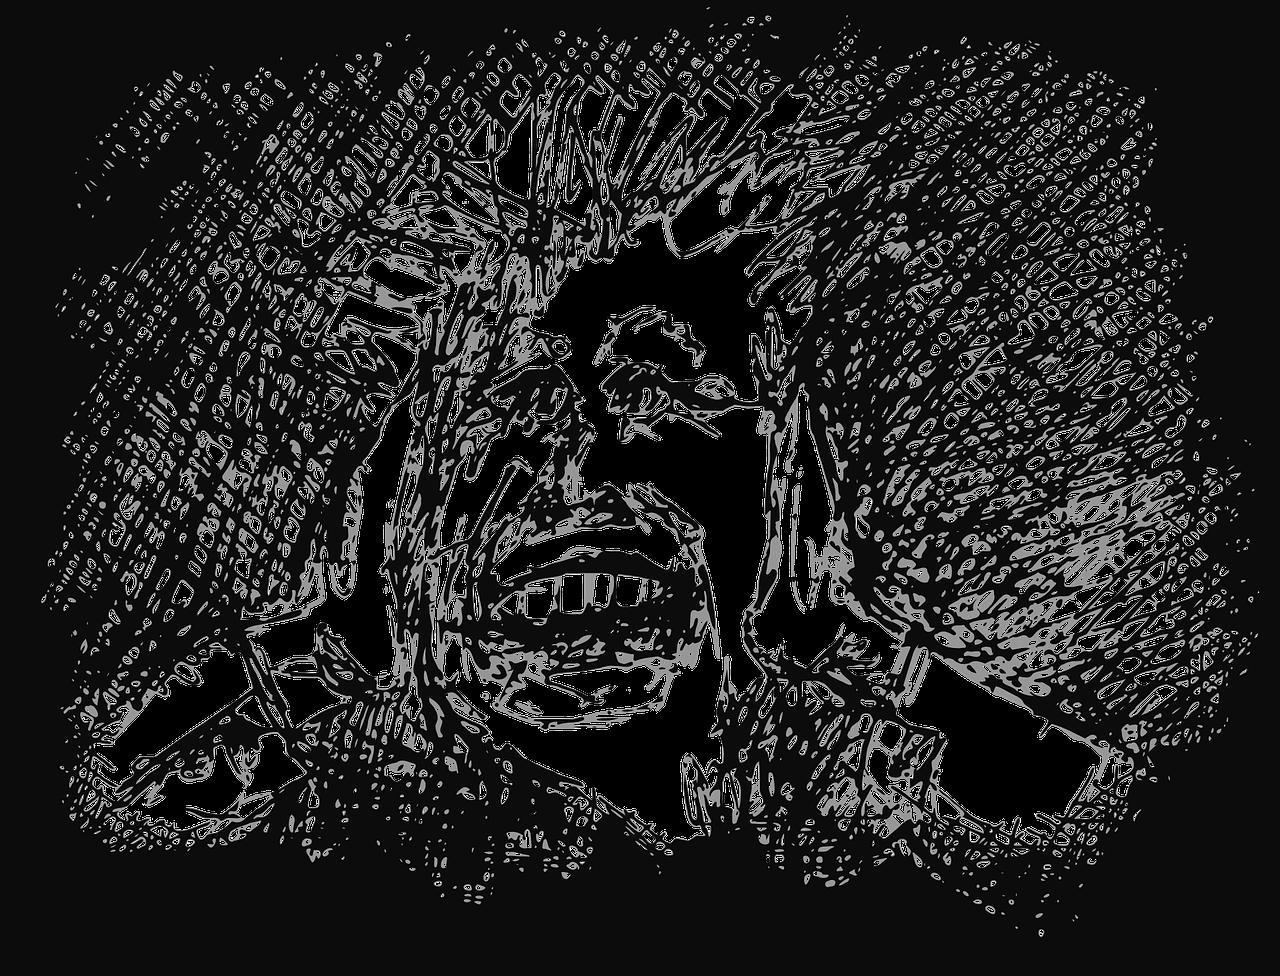 mimic-156928_1280